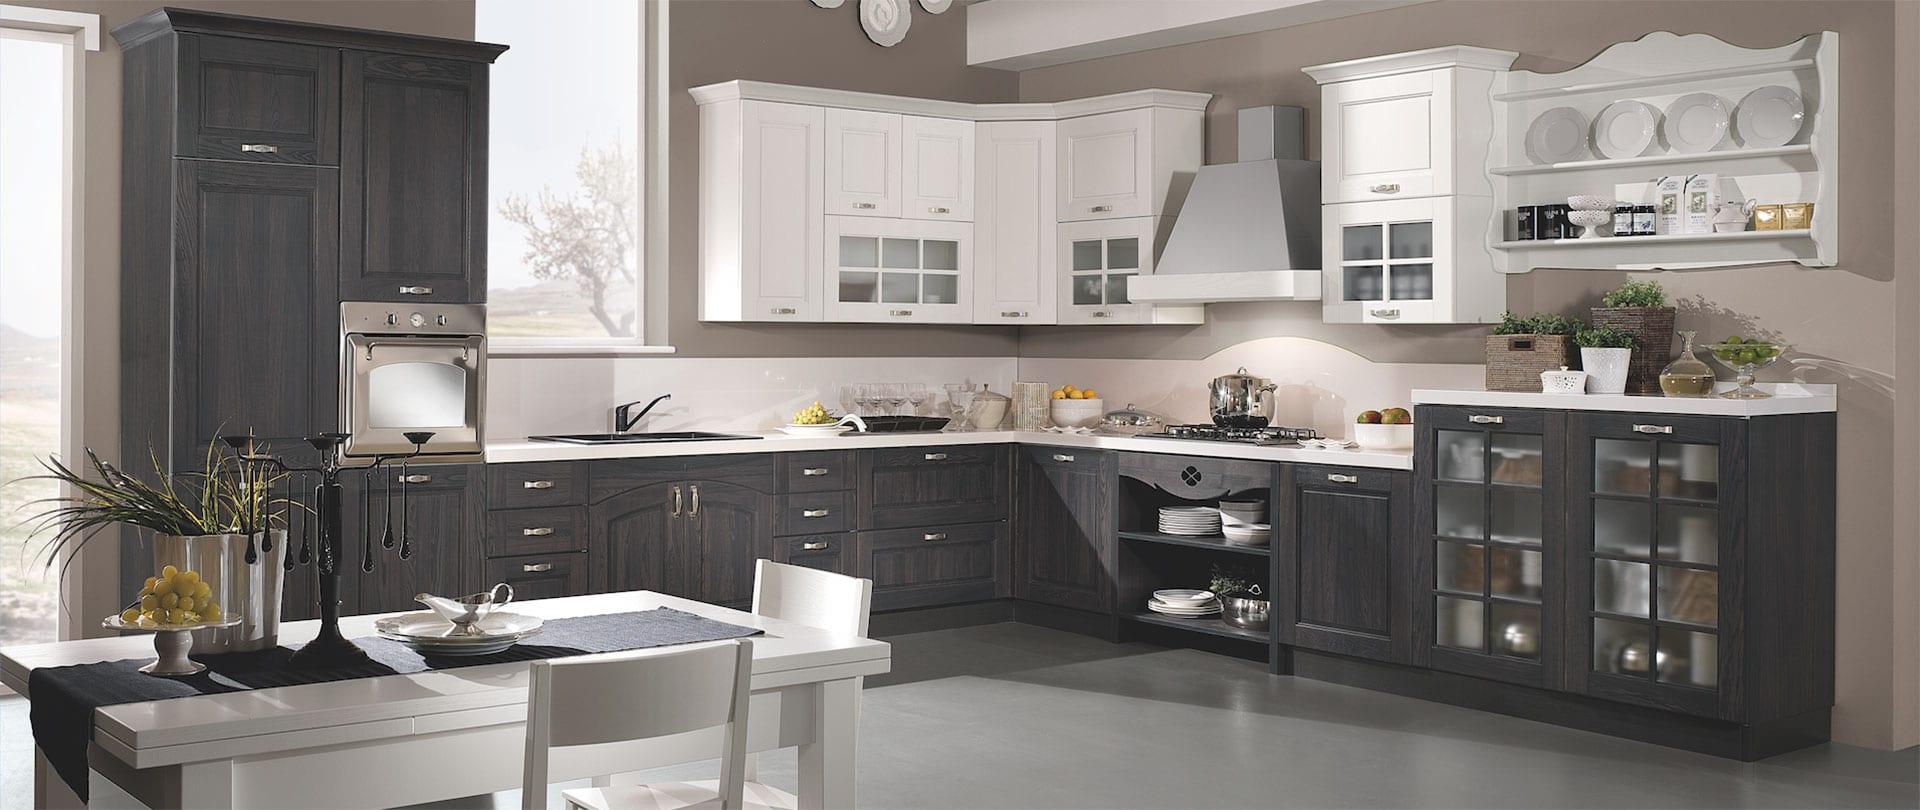 03bis-cucina-elegante-classica